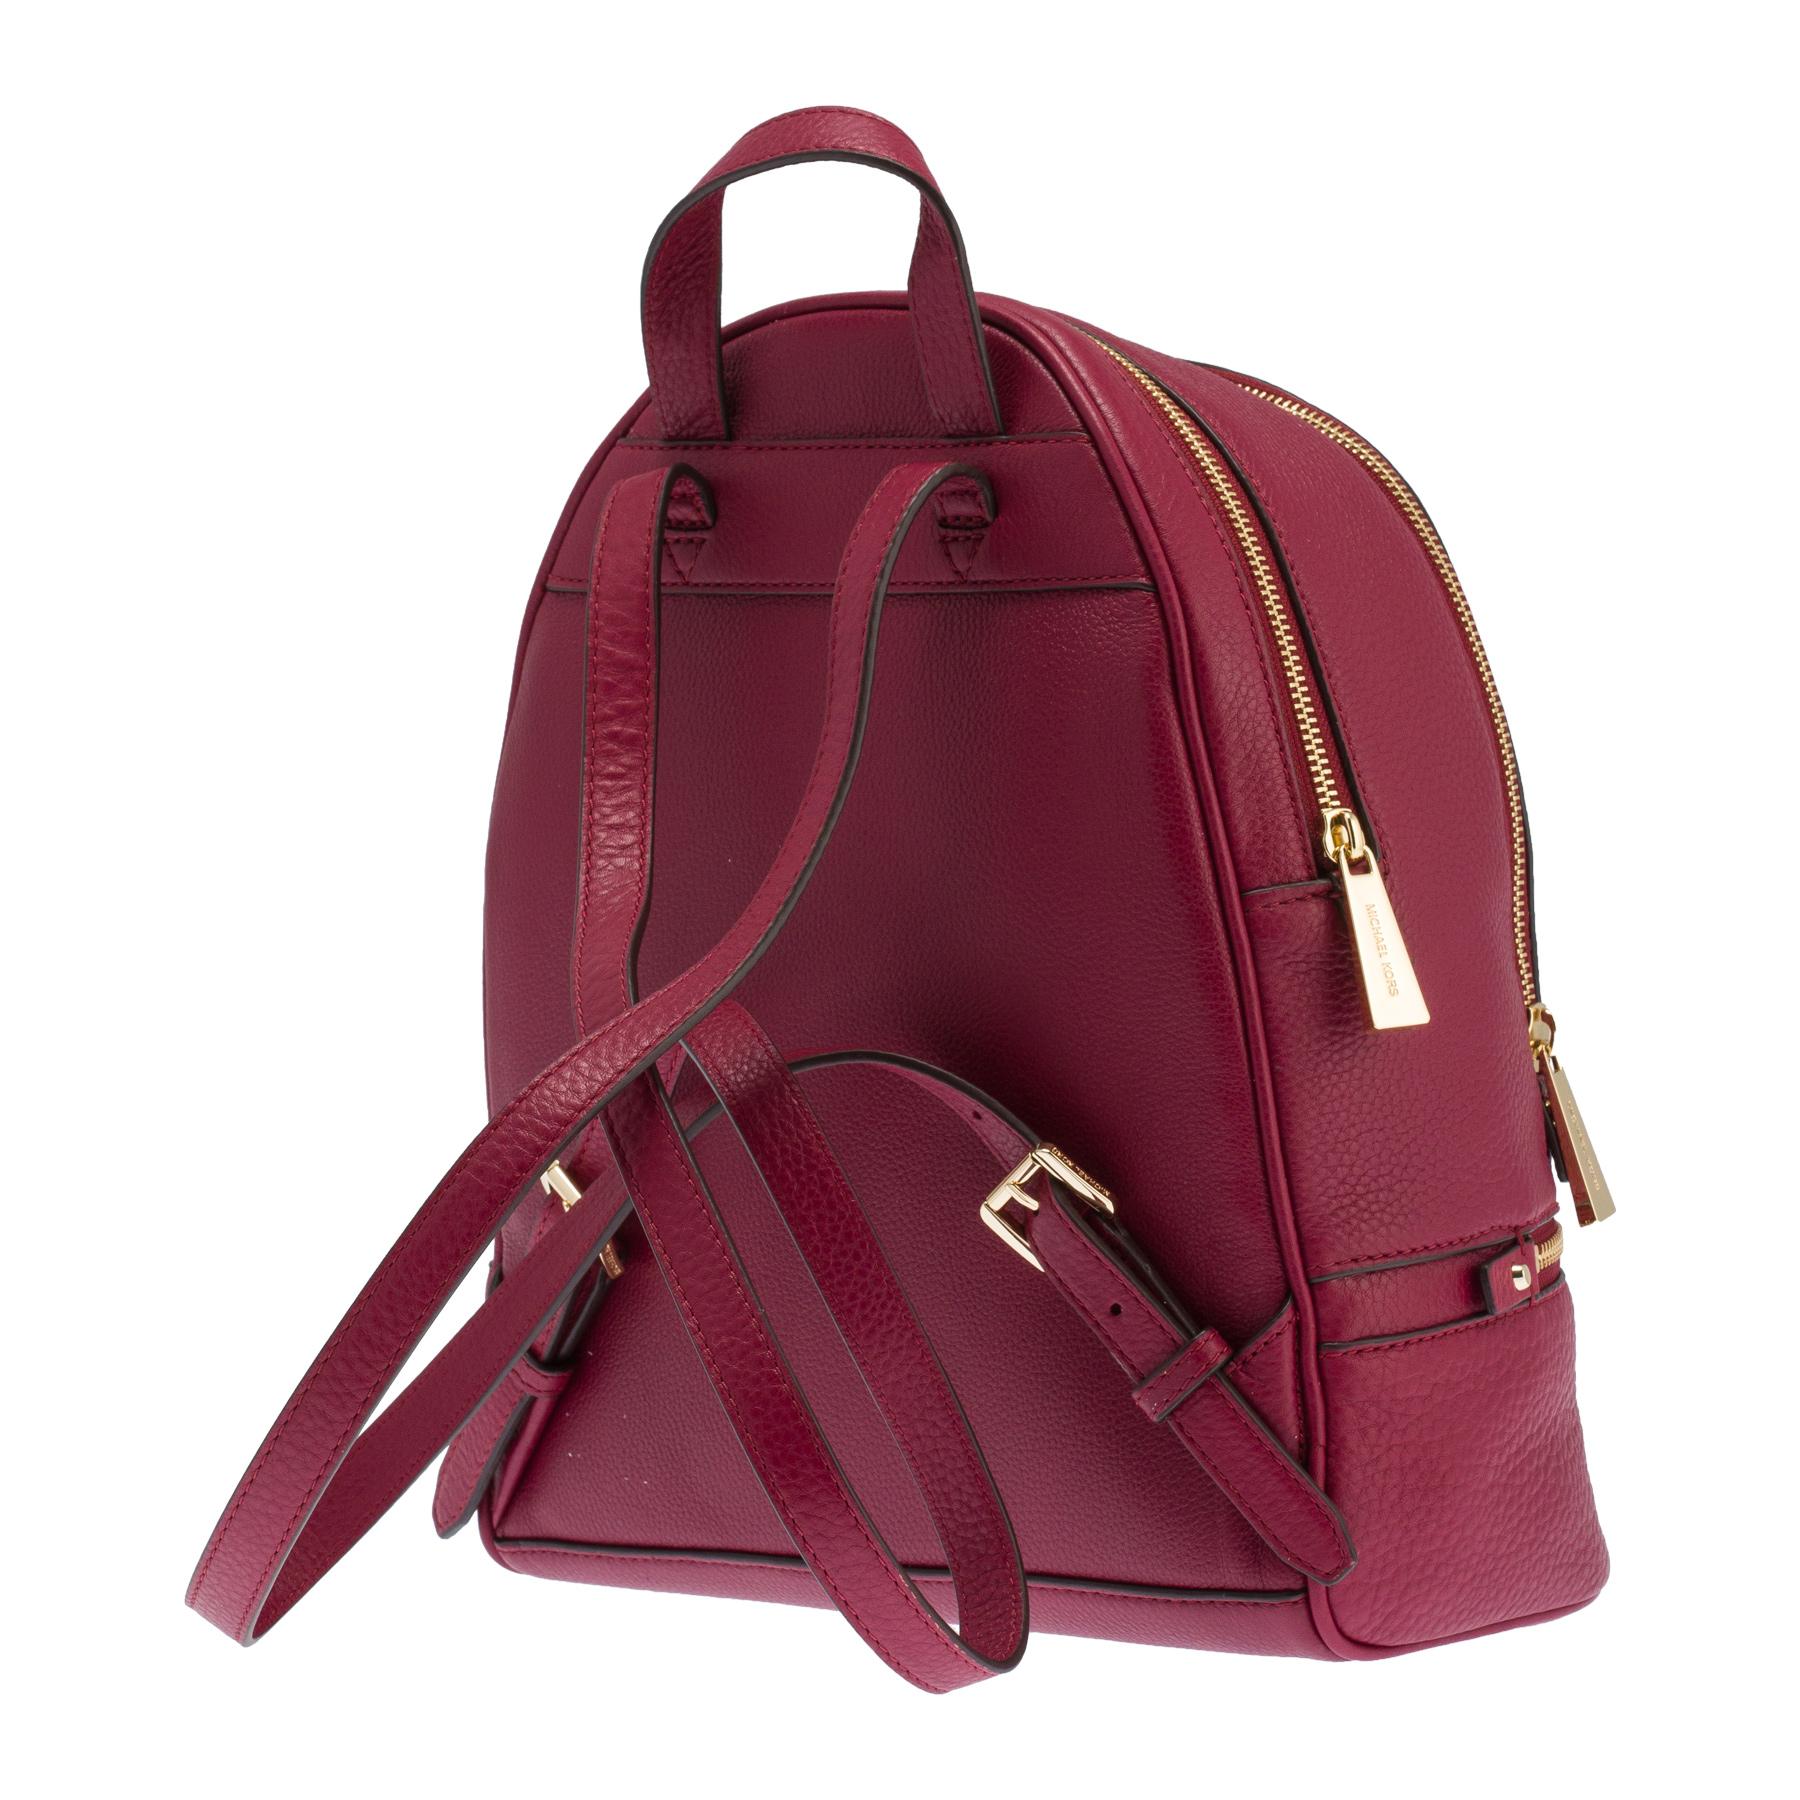 49424c631c Michael Kors Σακίδιο Πλάτης (Backpack) Κερασί ( Maroon )